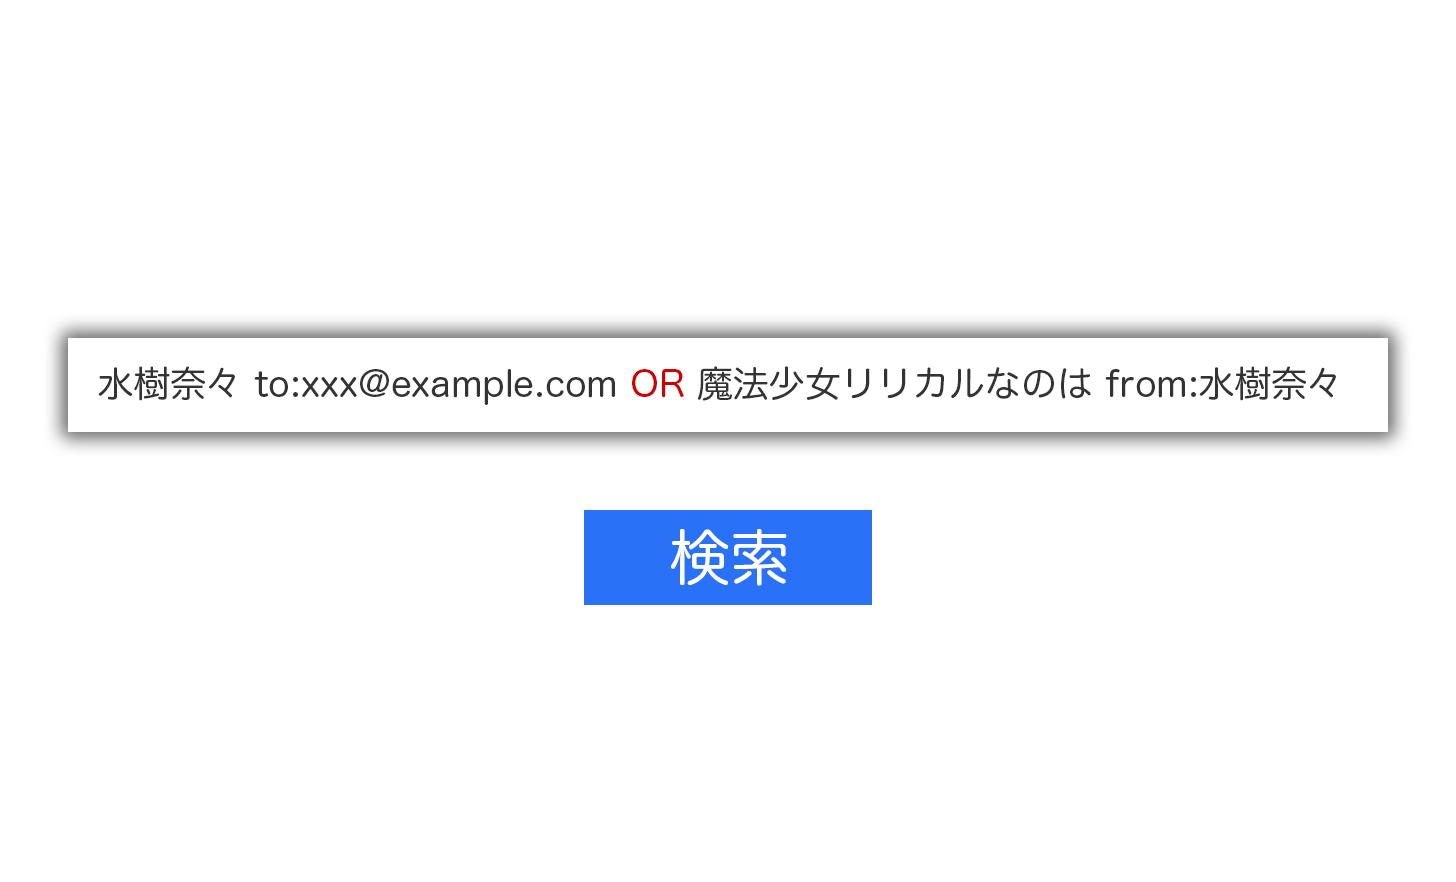 GmailでOR検索する方法。